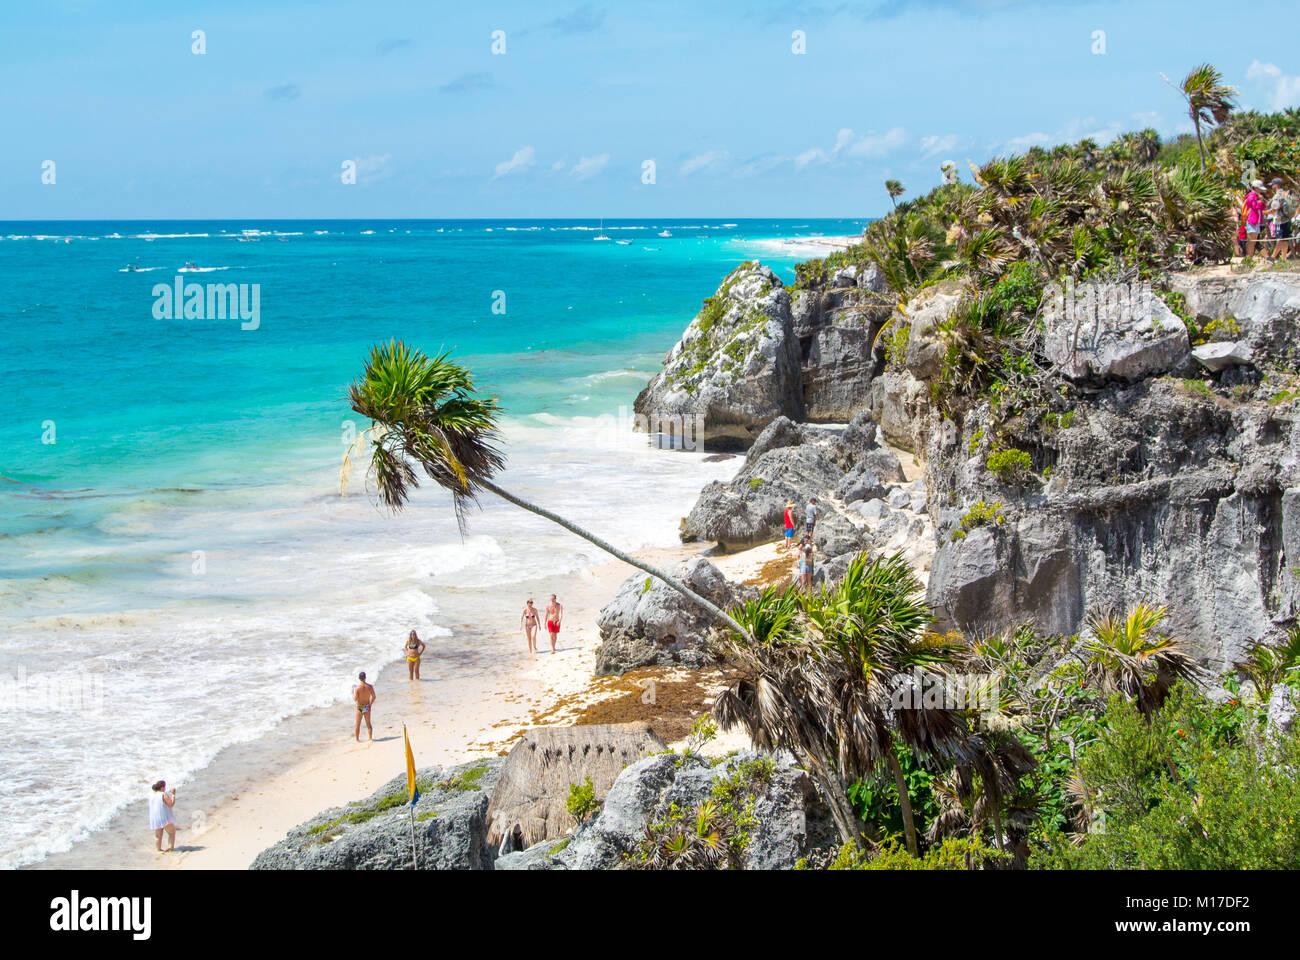 Tulum ruinas Yucatan Peninsula Mexico Stock Photo